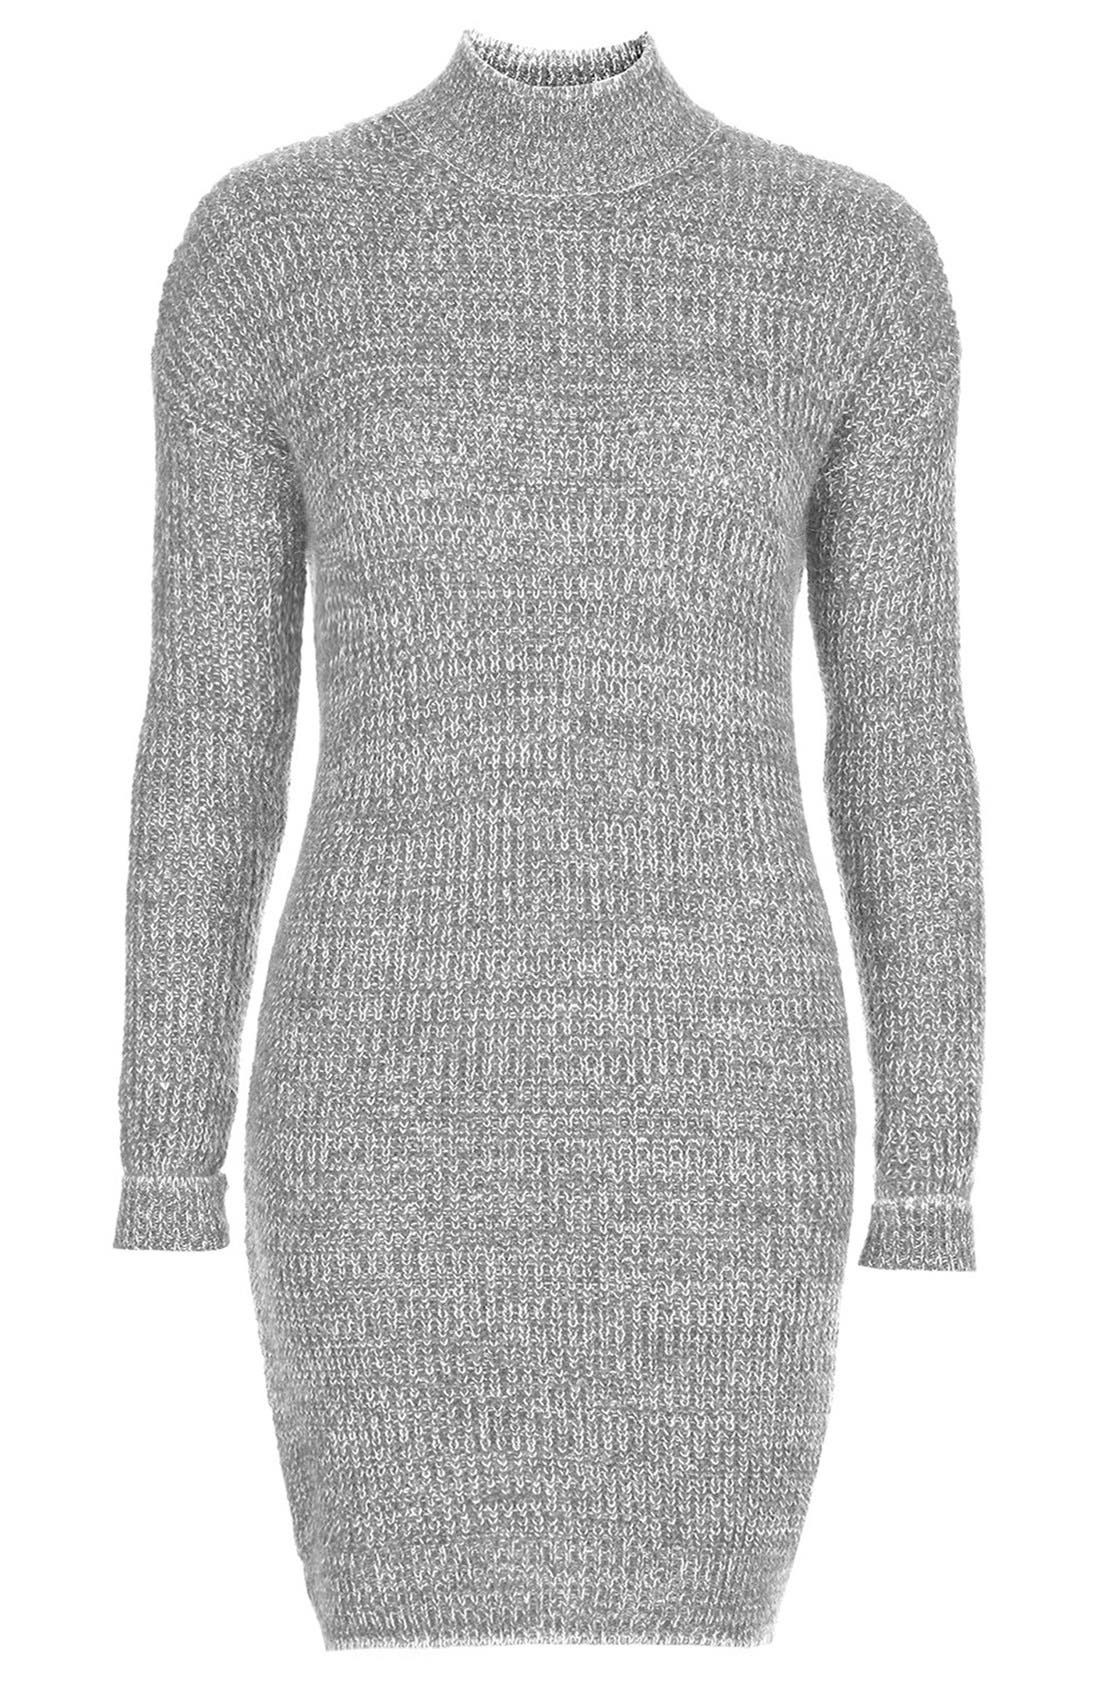 Sweater Dress,                             Alternate thumbnail 2, color,                             020